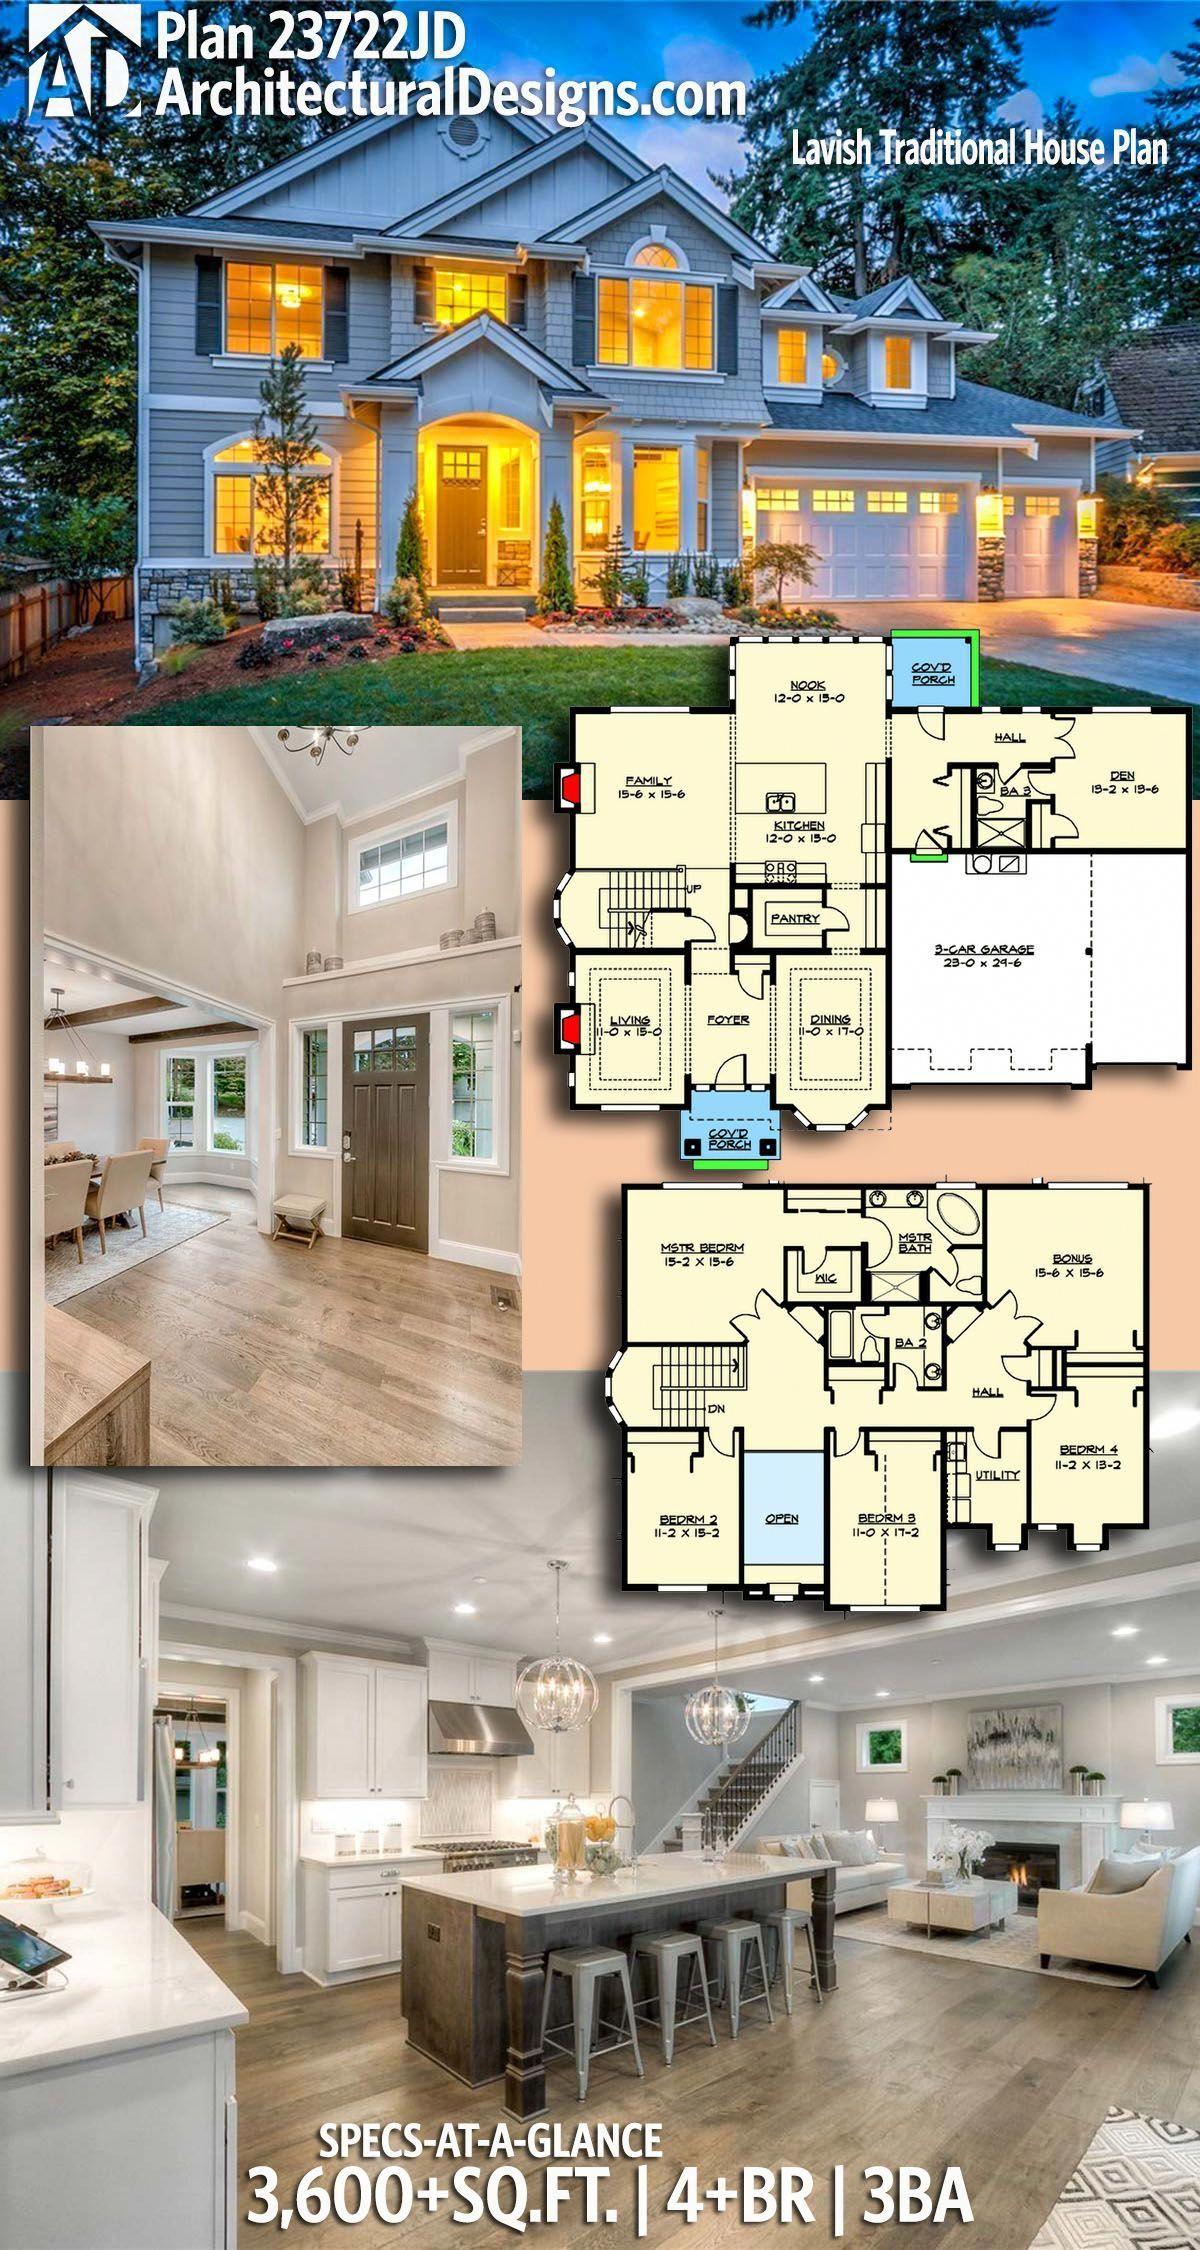 Photo of Plan 23722JD: Lavish Traditional House Plan